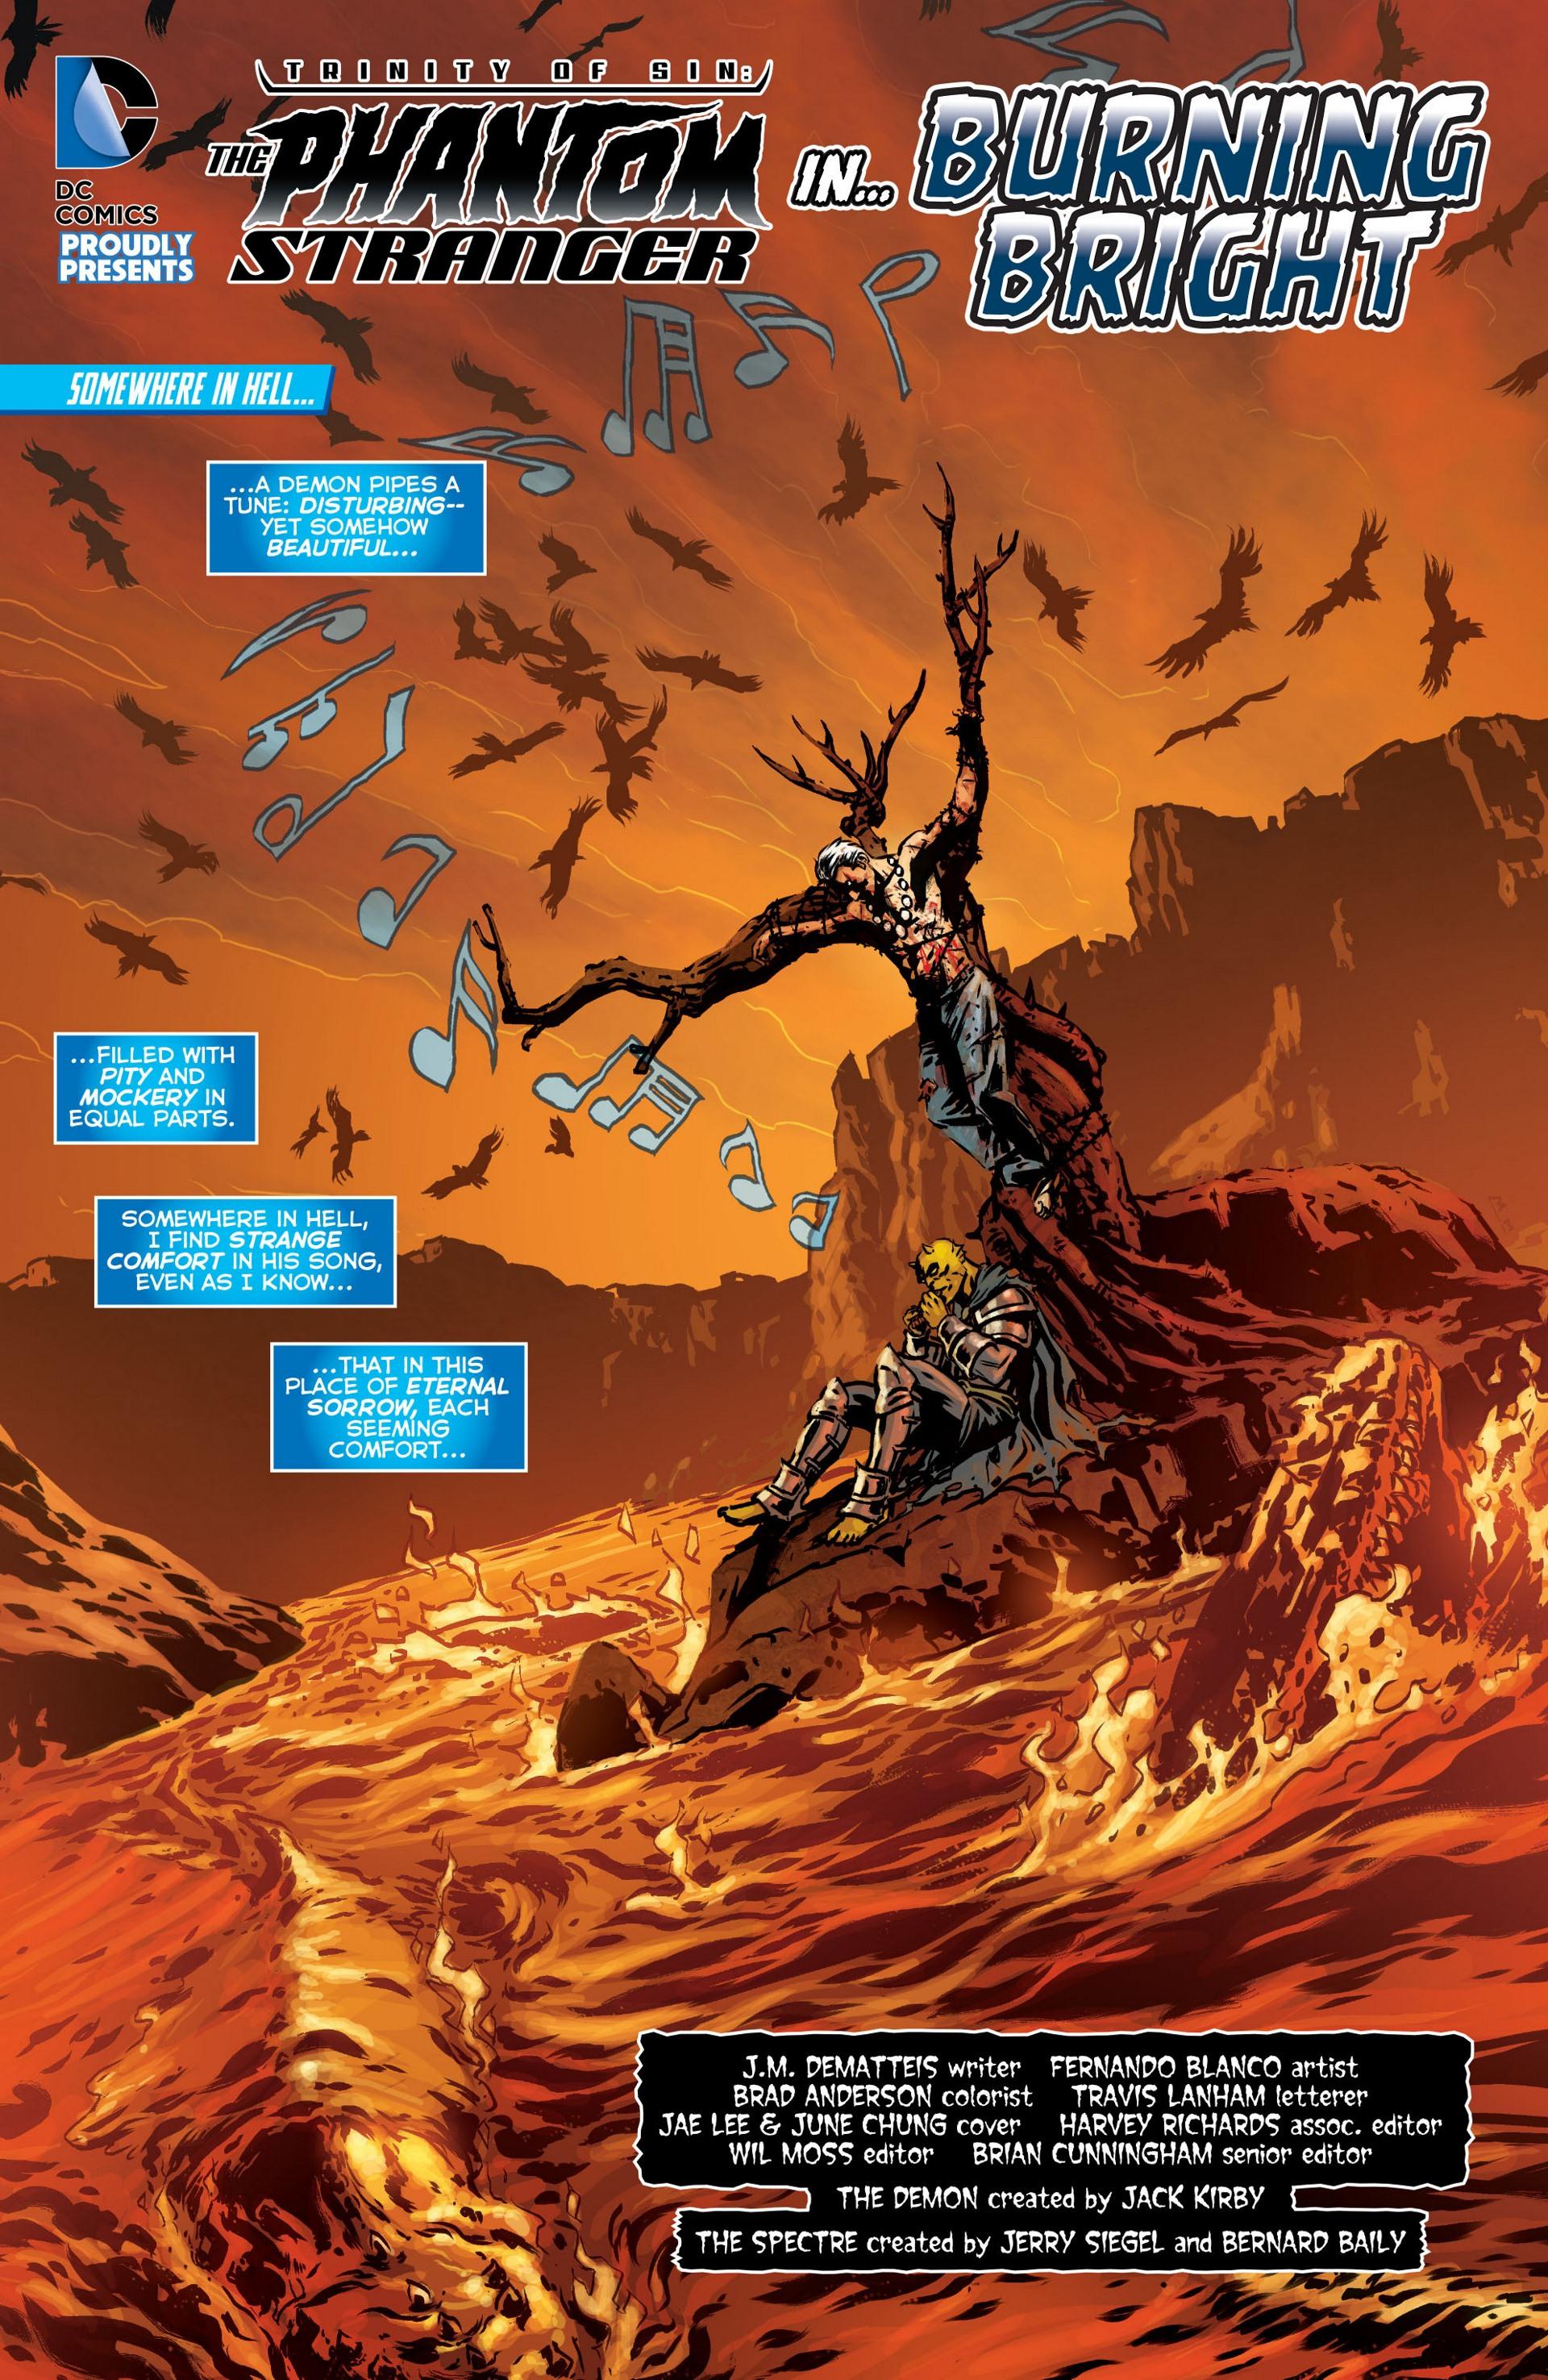 Read online Trinity of Sin: The Phantom Stranger comic -  Issue #9 - 2